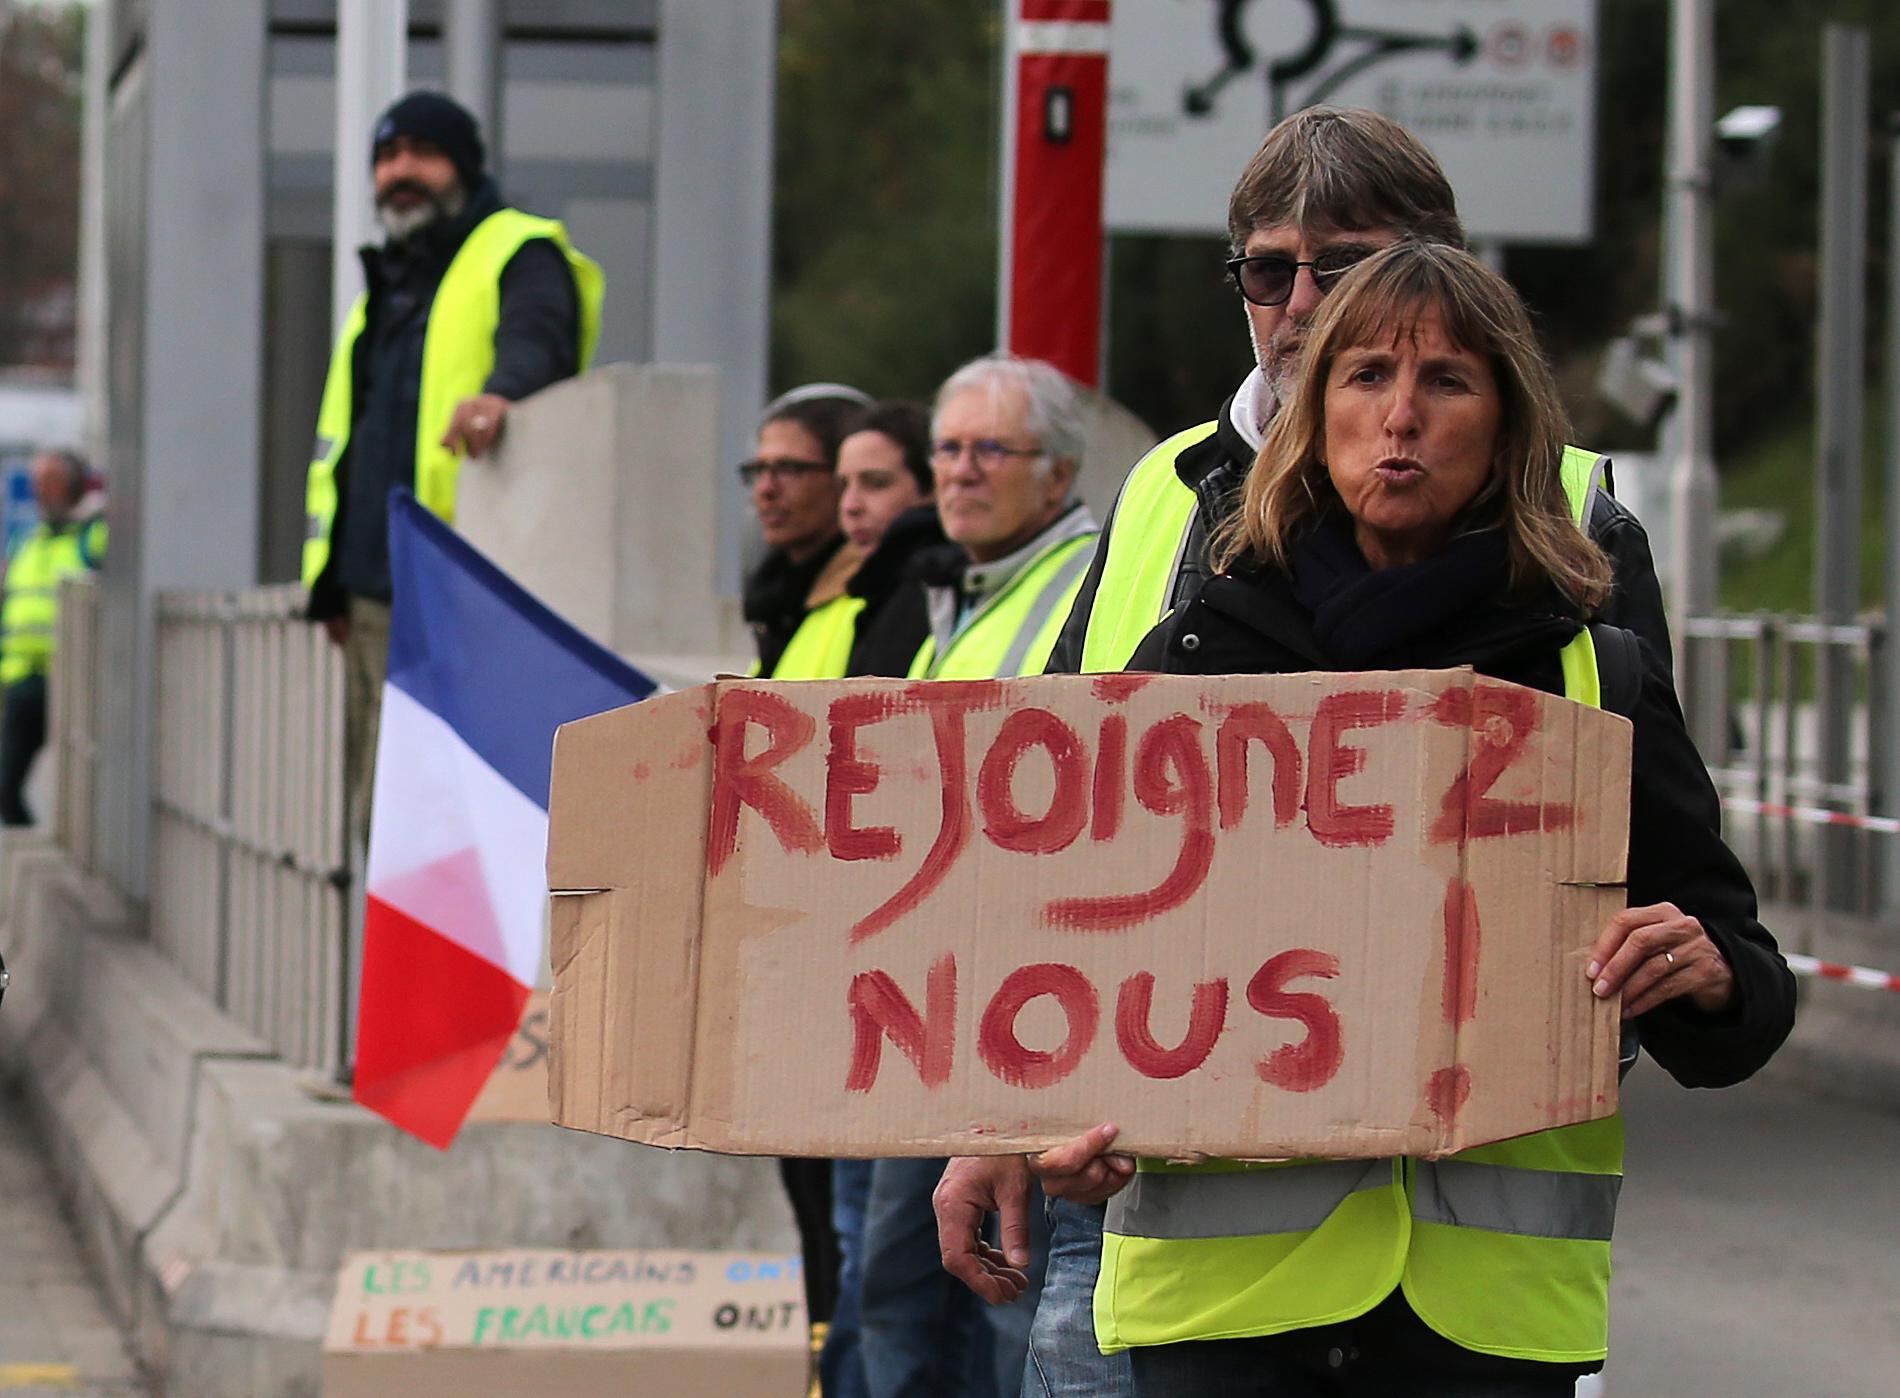 Demonstrators at toll gates on a motorway in Biarritz